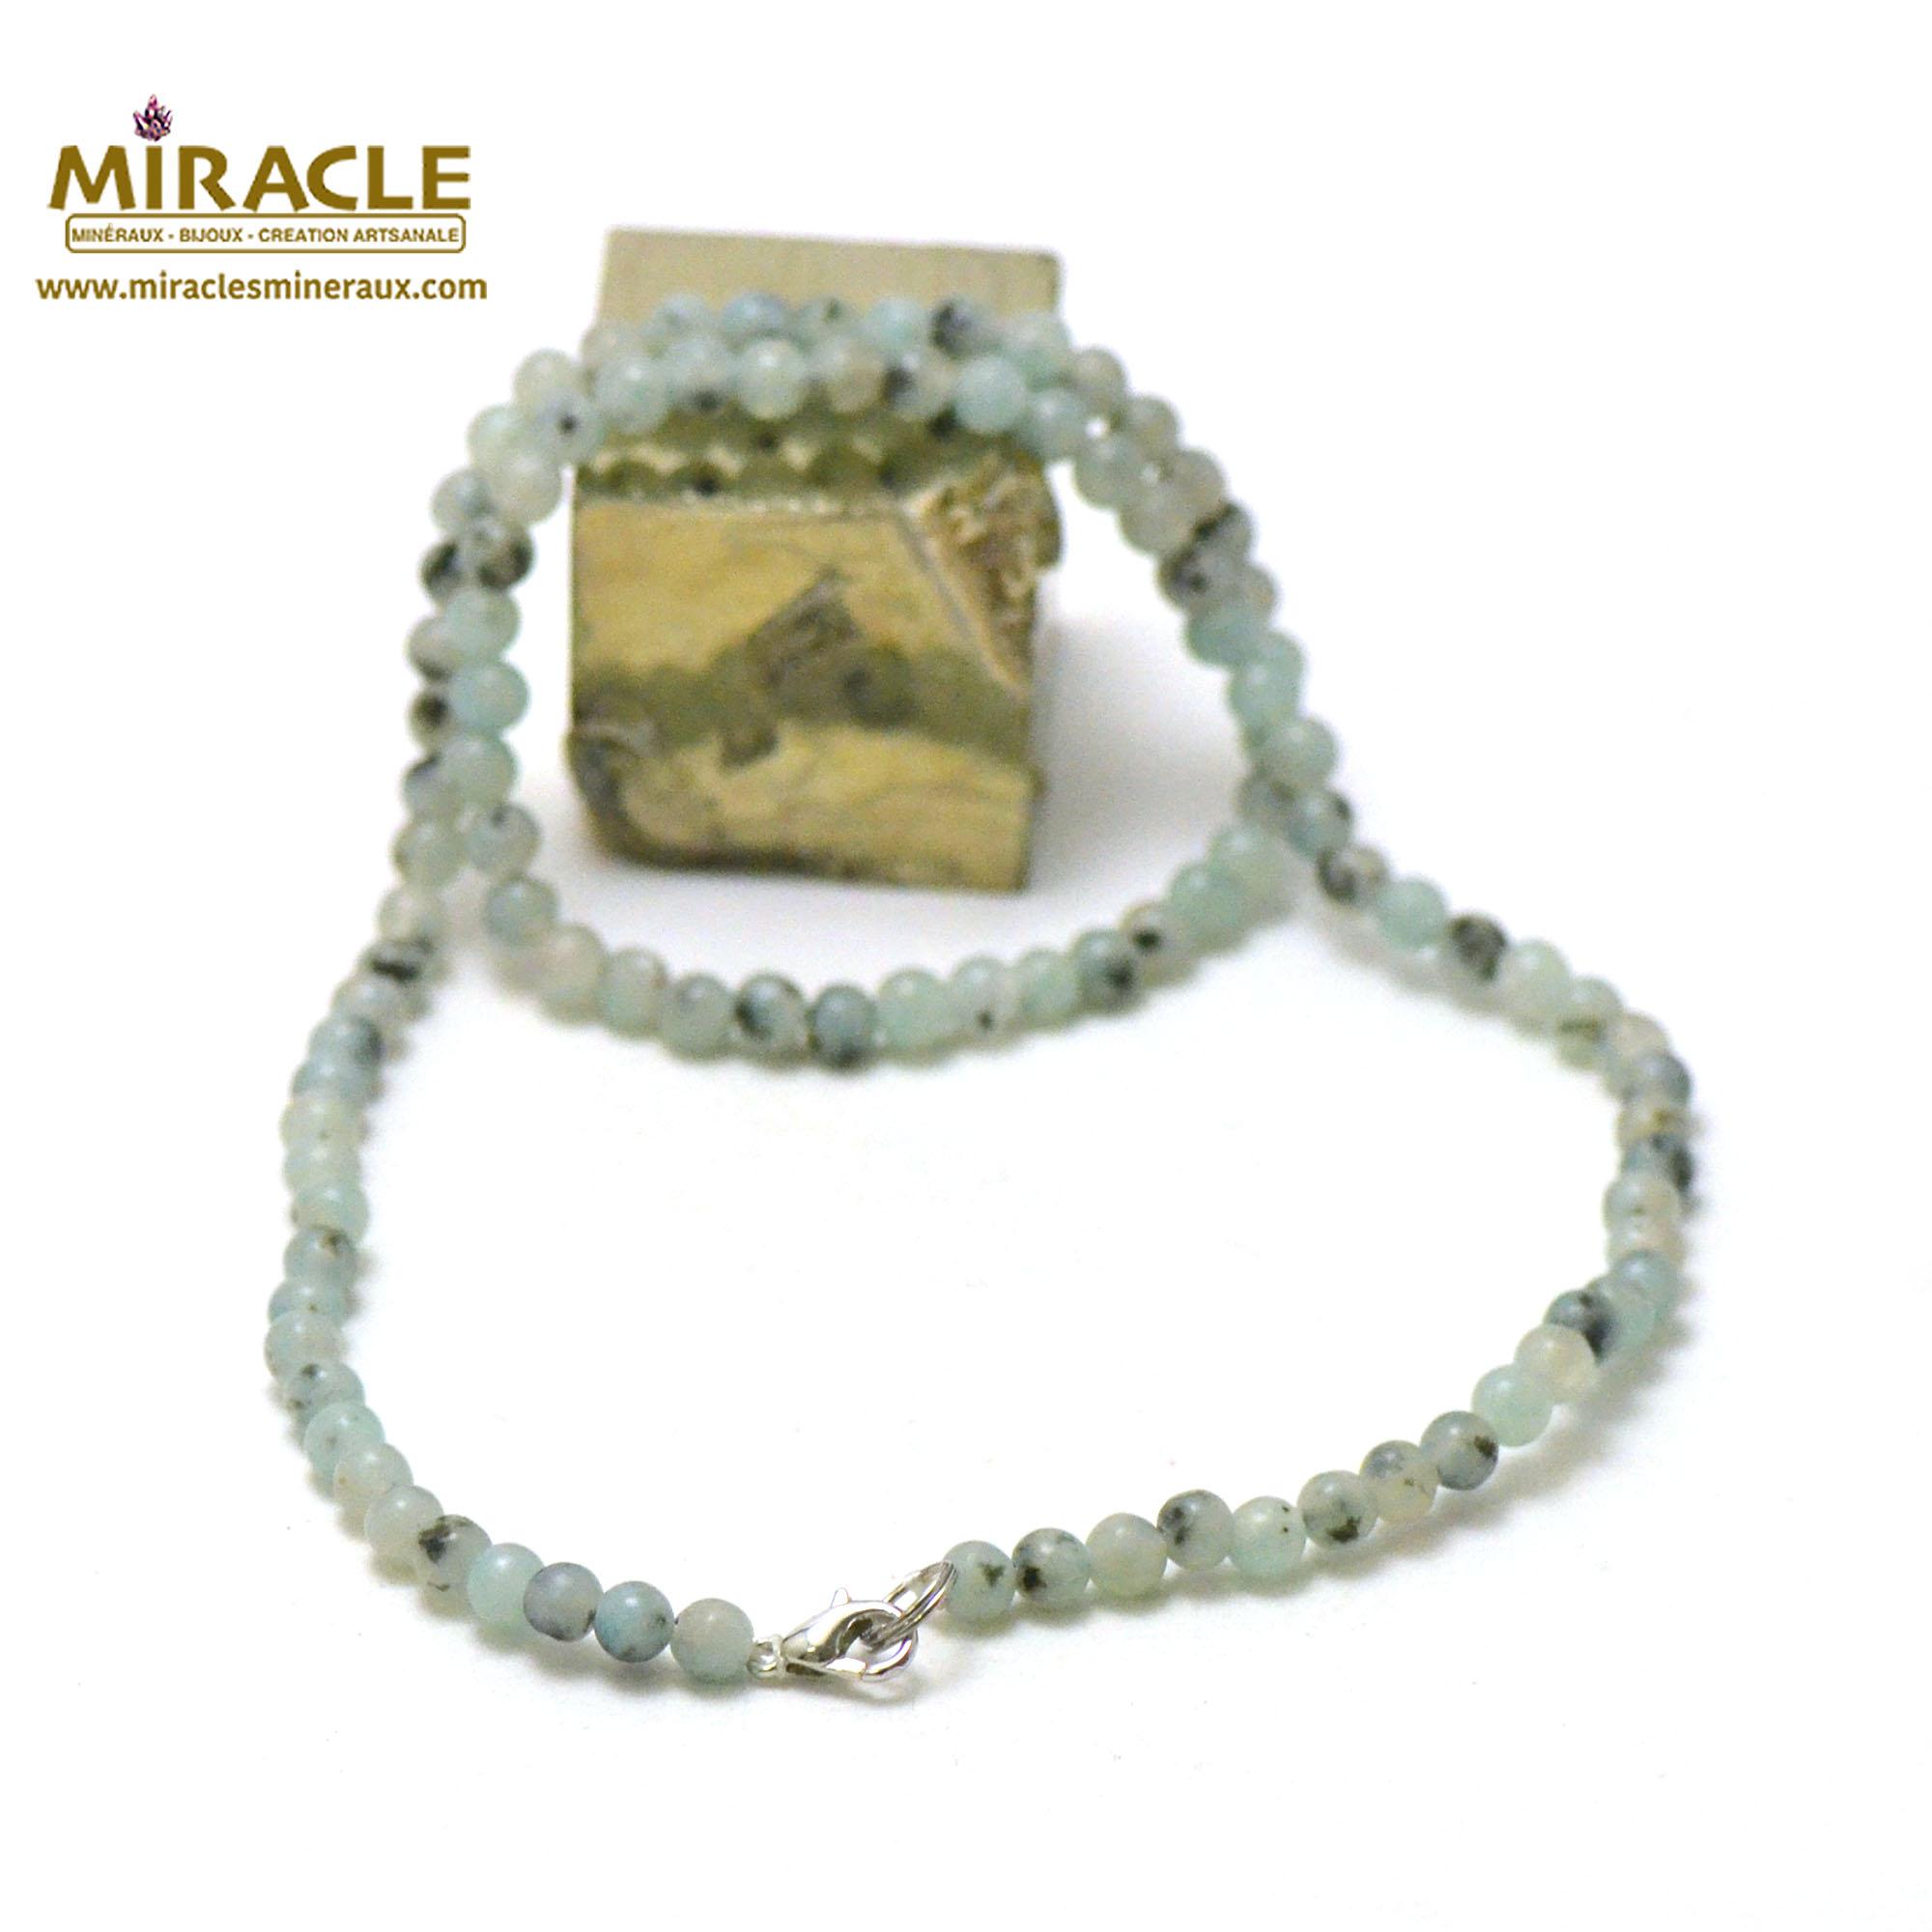 collier Jade néphrite des Andes perle ronde 4 mm